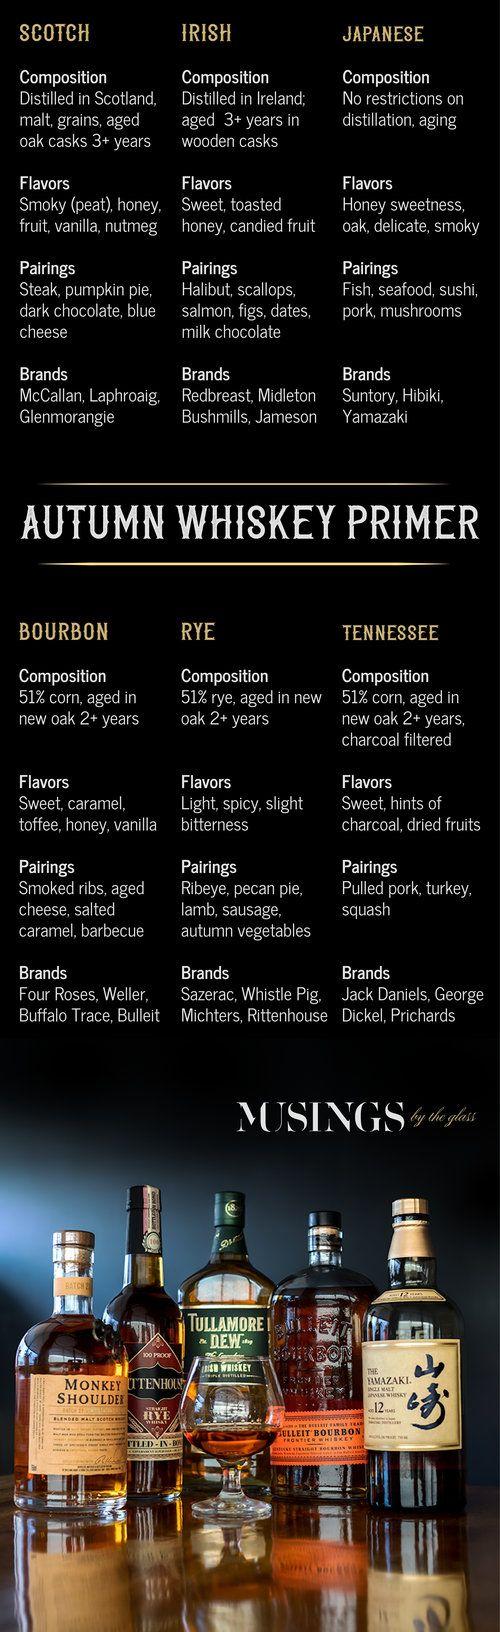 Whiskey Basics Chart for Scotch, Irish, Japanese, Bourbon, Rye and Tennessee Whiskeys. Brands, Pairing Tips, Tasting Notes.